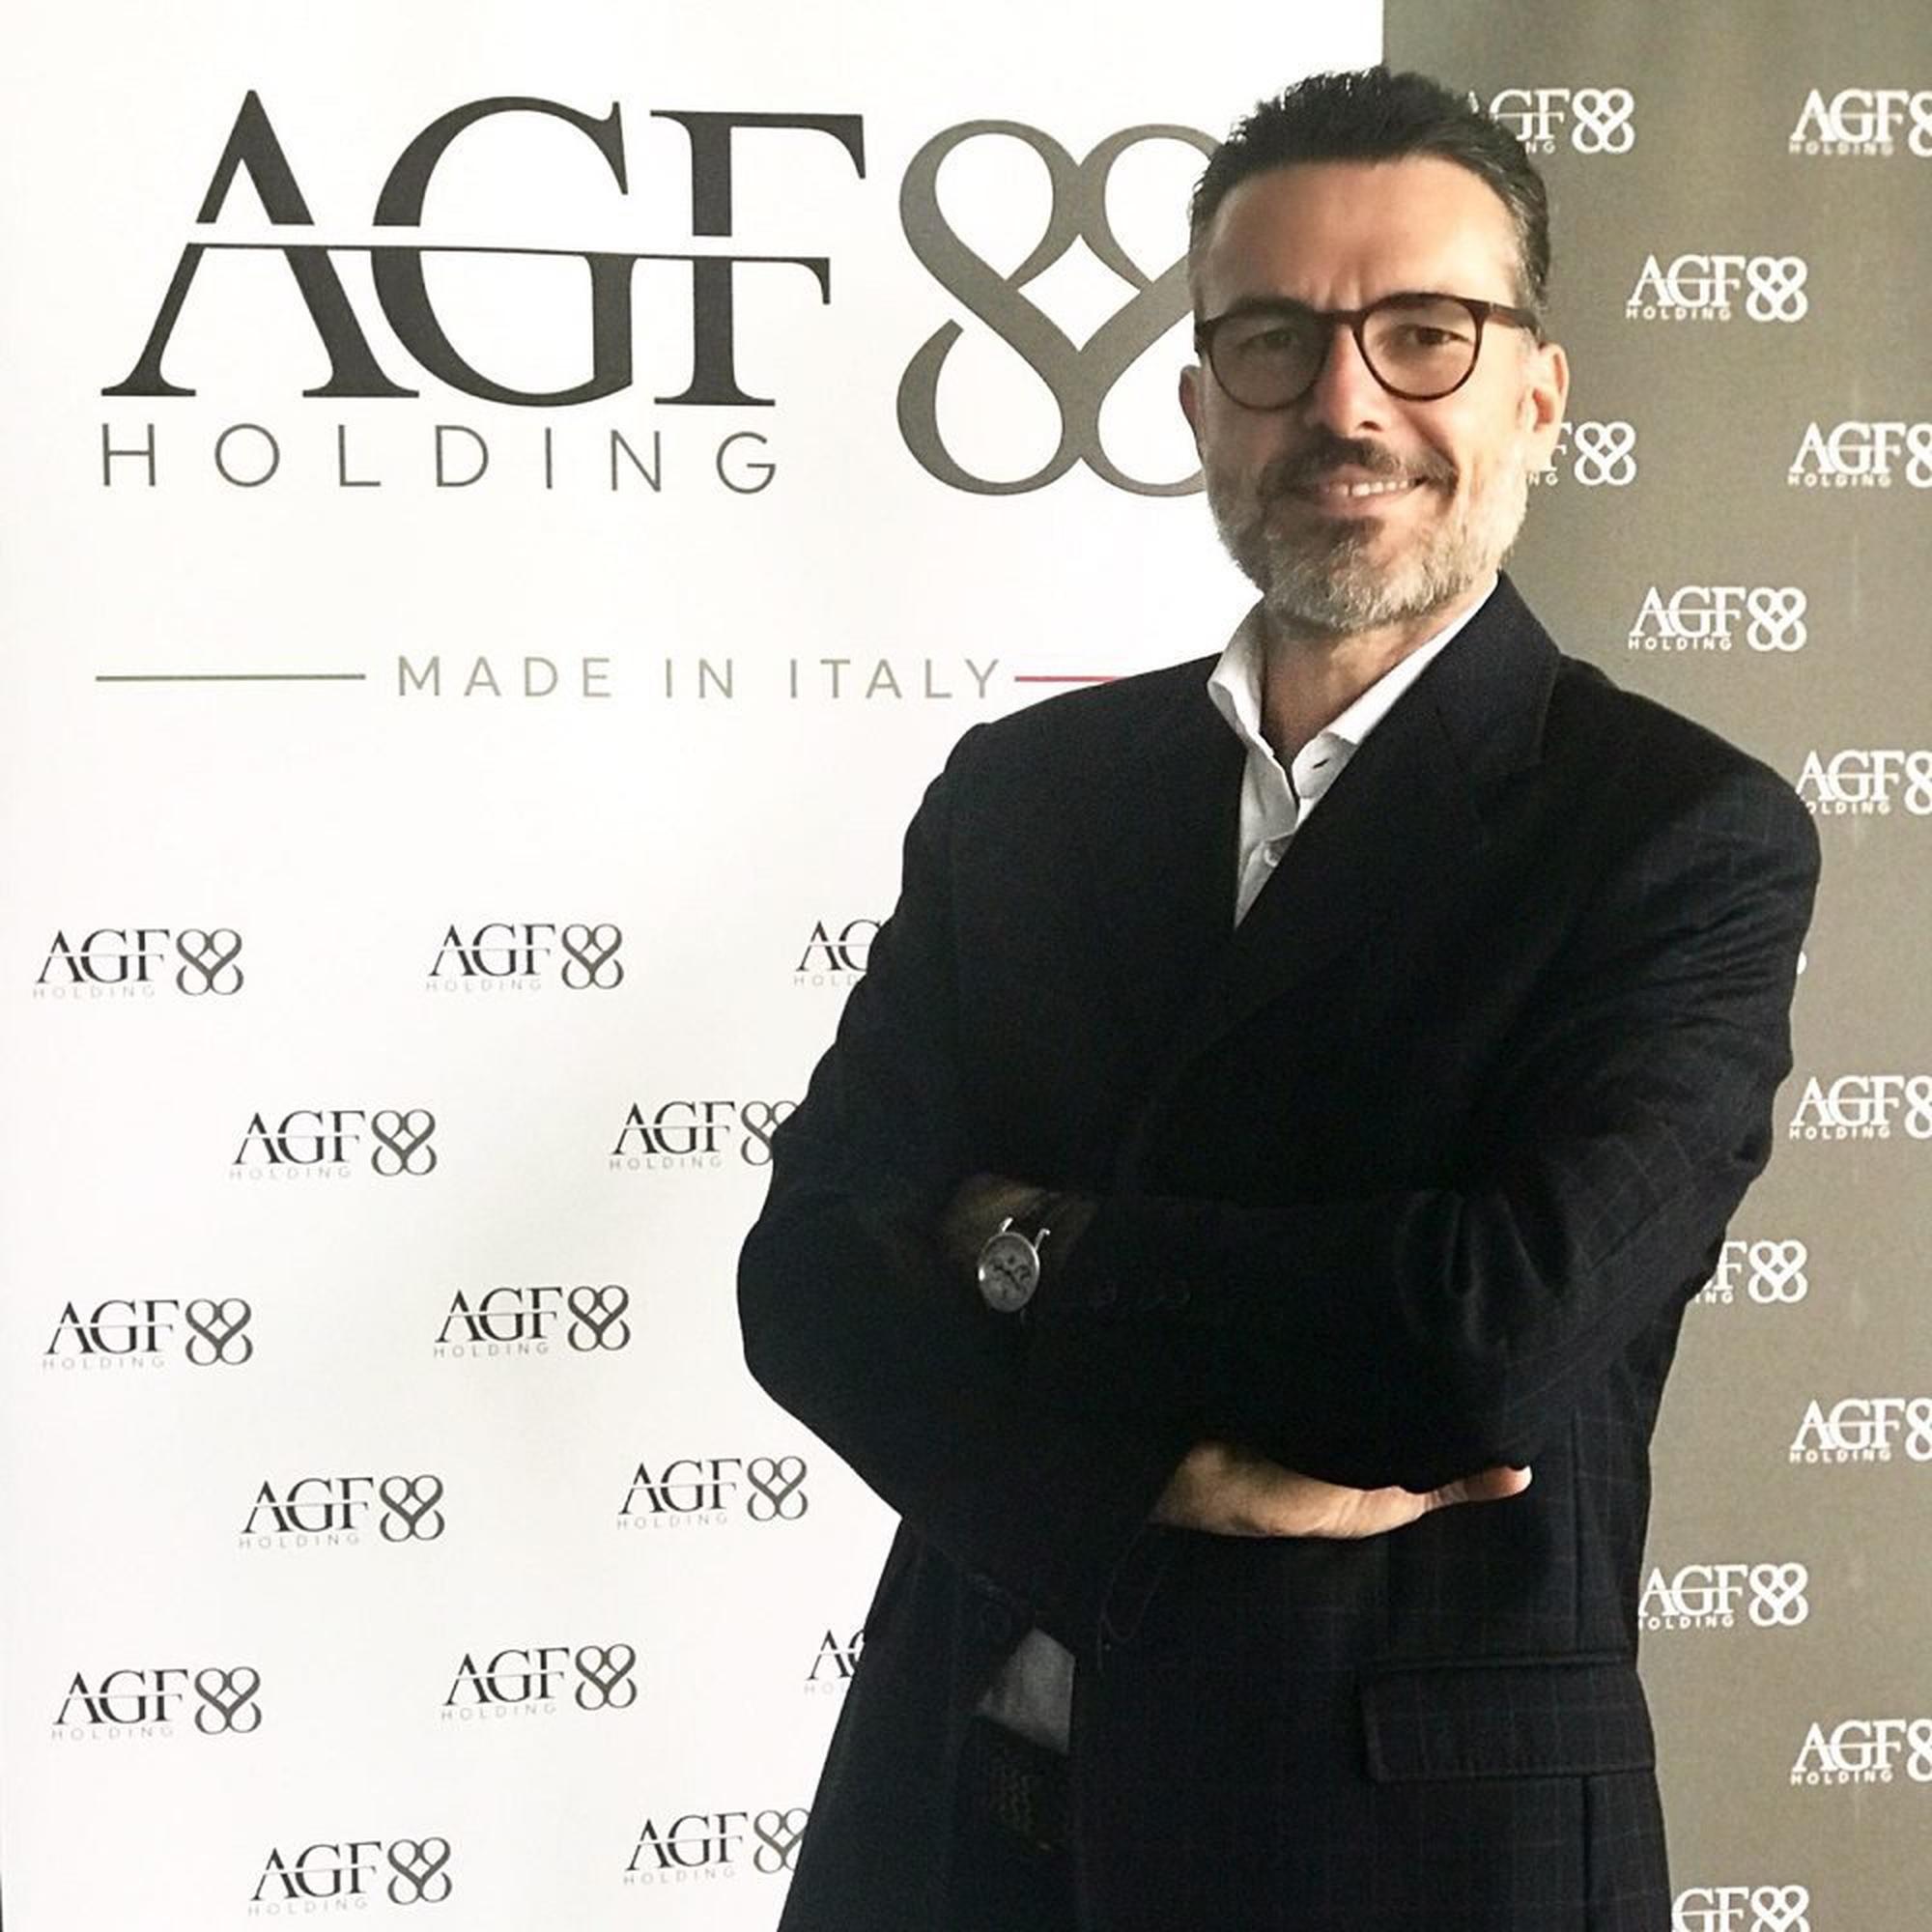 Gianni Pegorin, President of AGF88 Holding